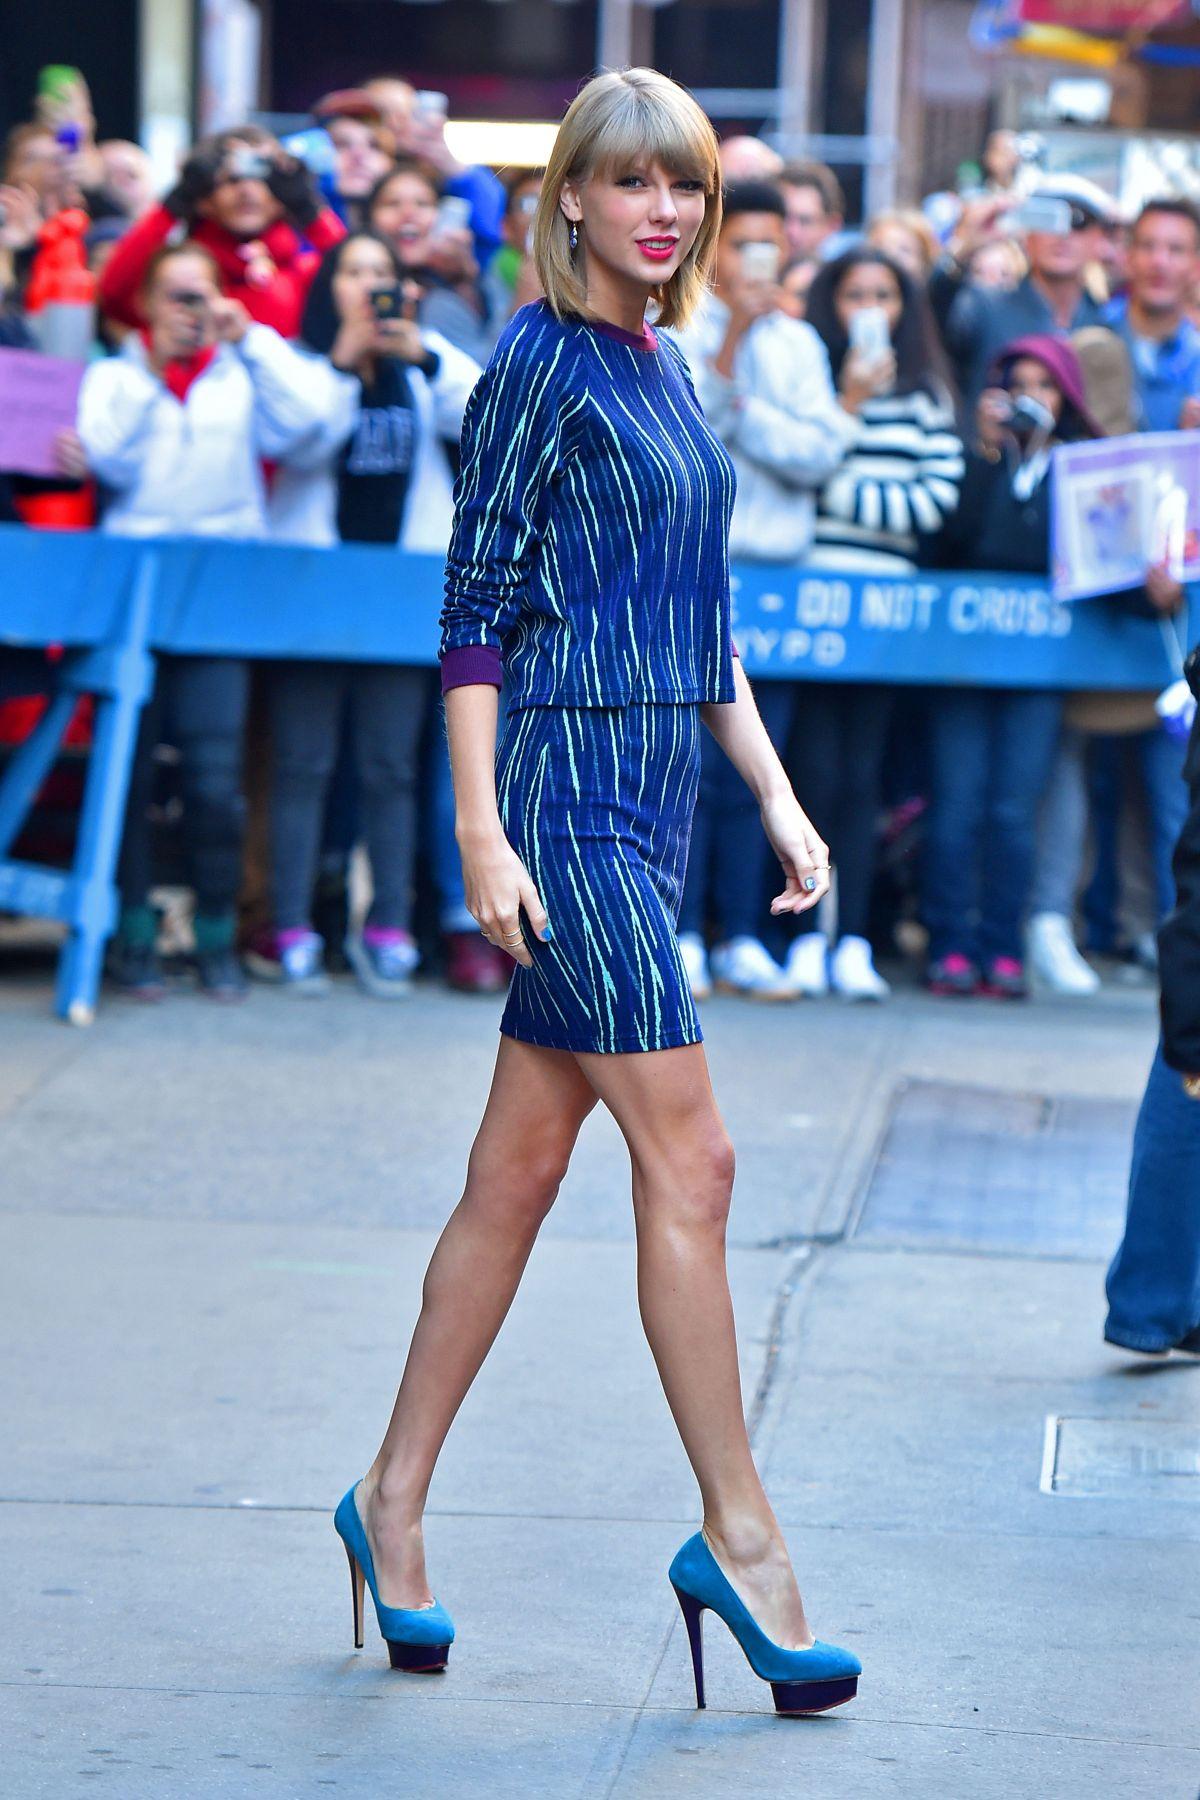 Good Morning America New York : Taylor swift arrives at good morning america in new york